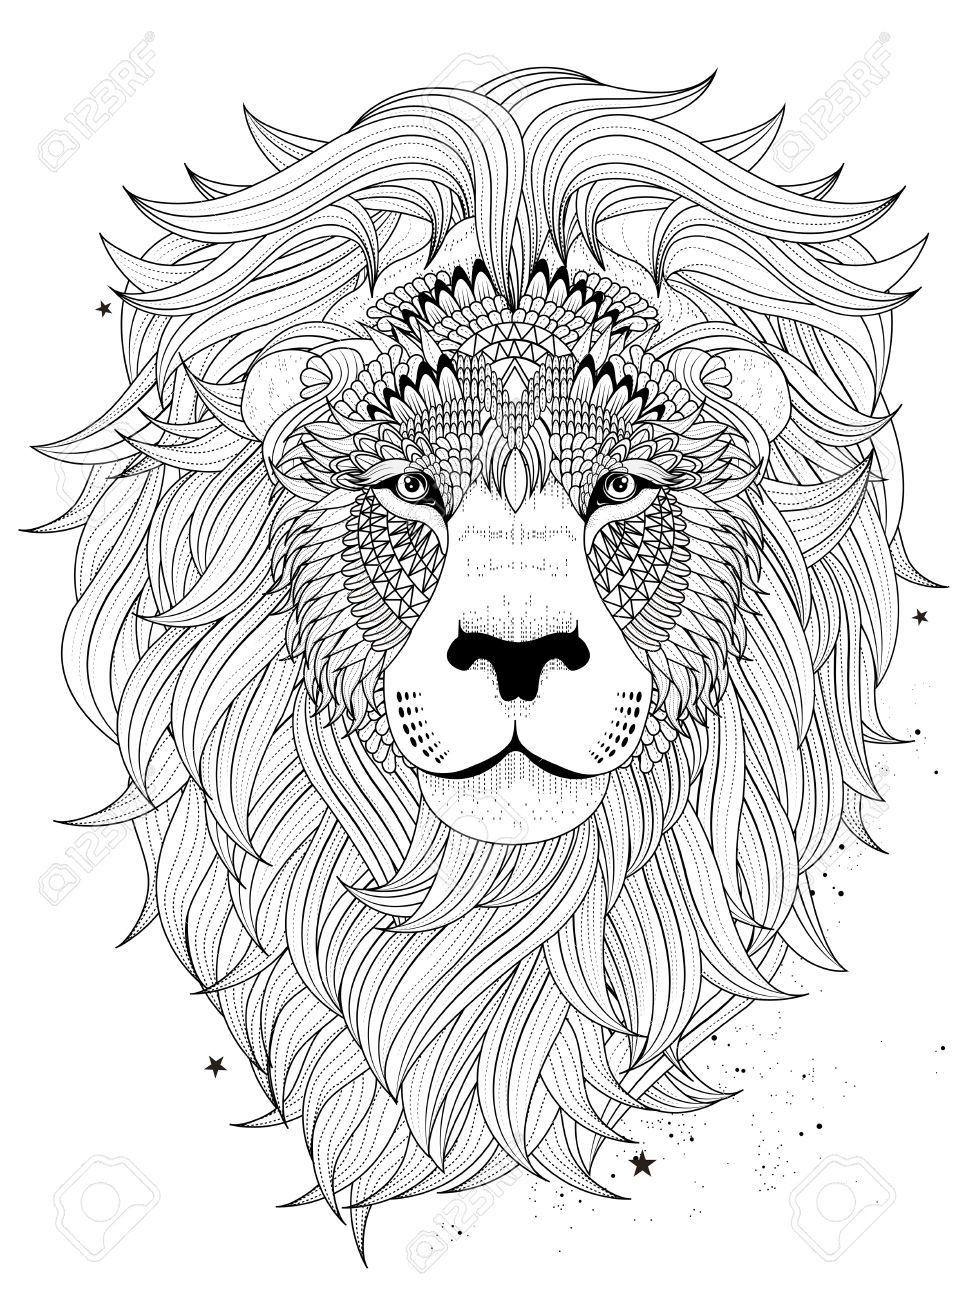 Lion Coloring Book Page Youngandtae Com Lion Coloring Pages Mandala Coloring Pages Animal Coloring Pages